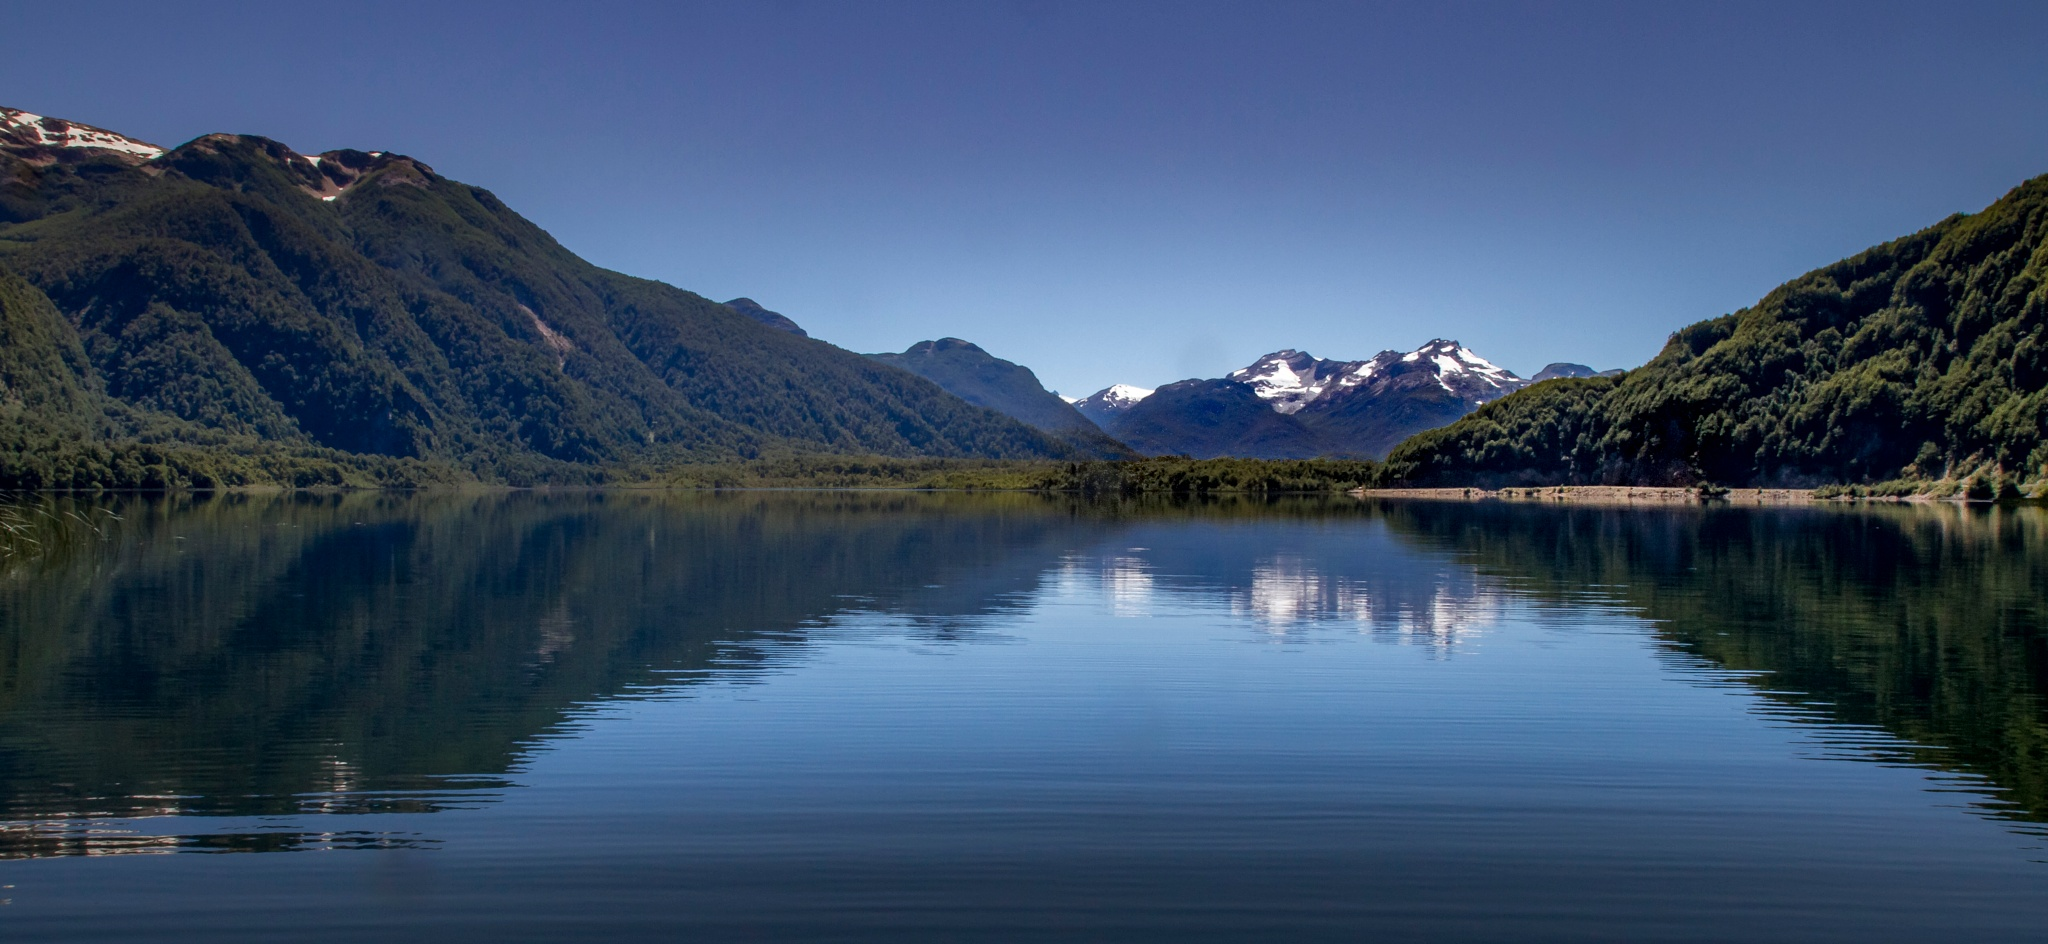 Chilean Patagonia  by Scottmcc